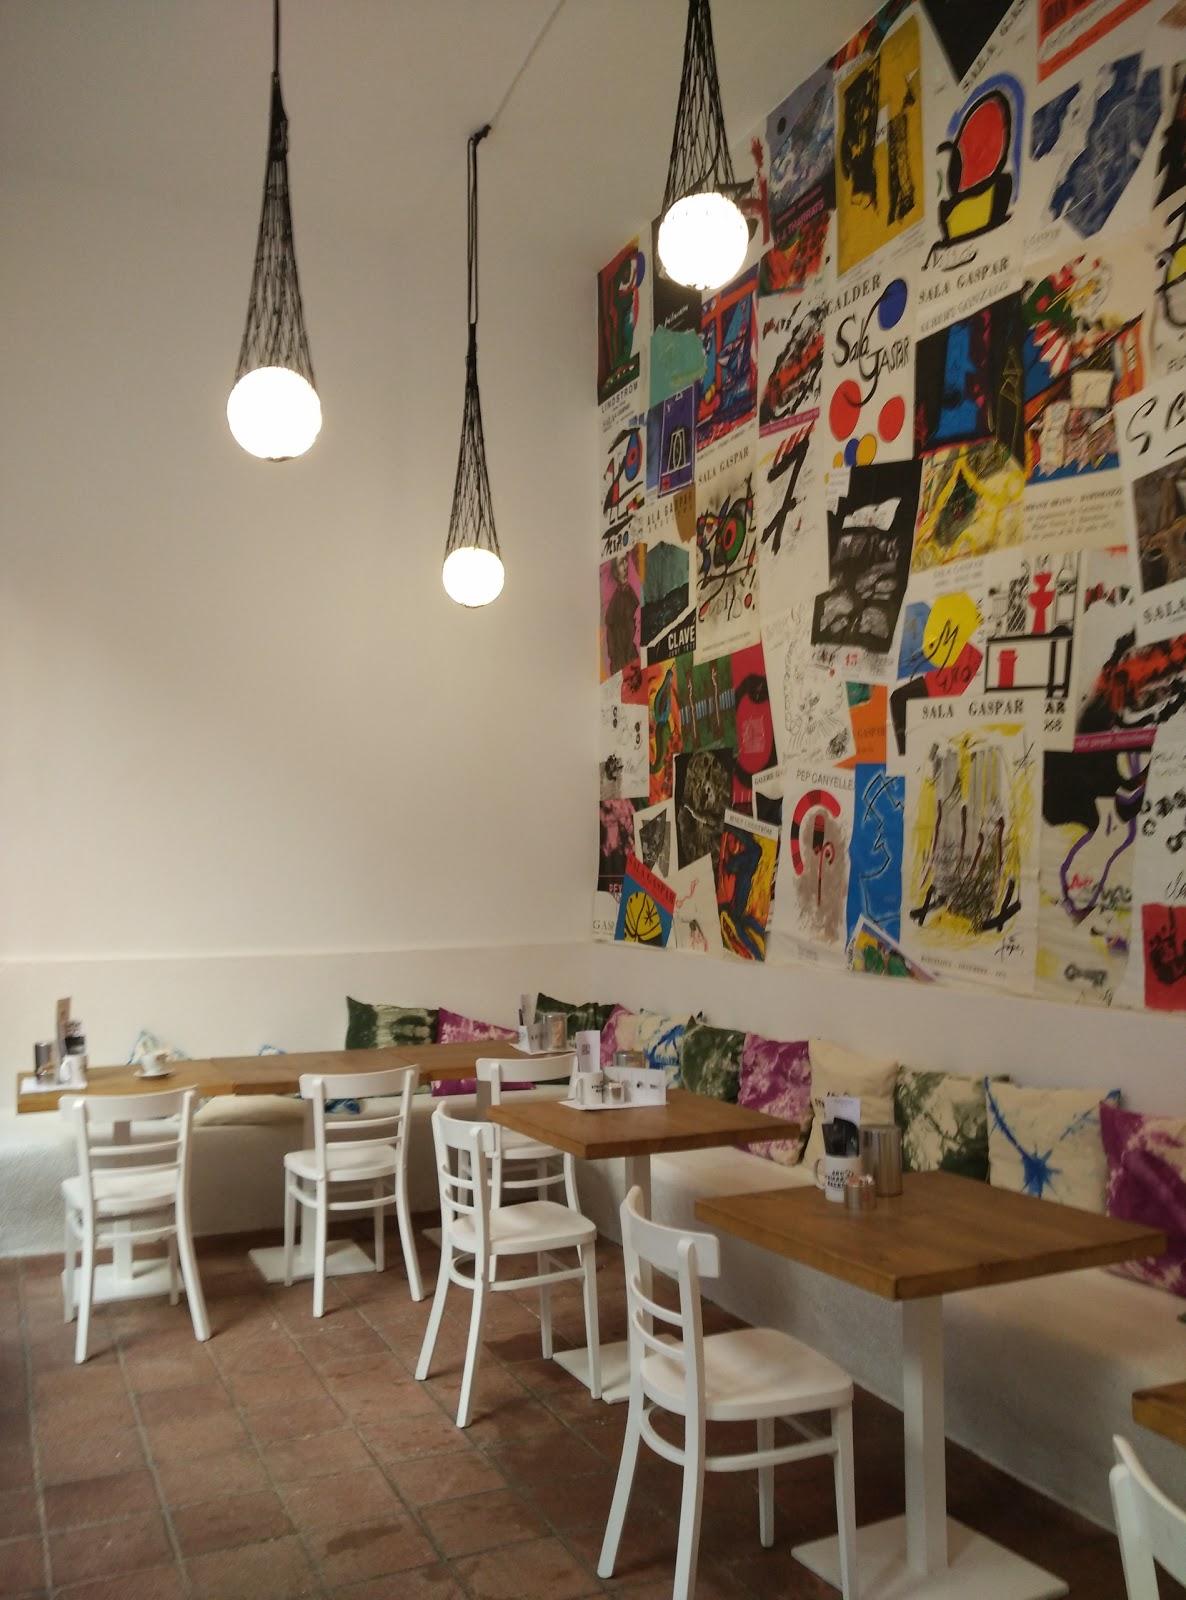 Fundació Gaspar: A Work-Friendly Place in Barcelona